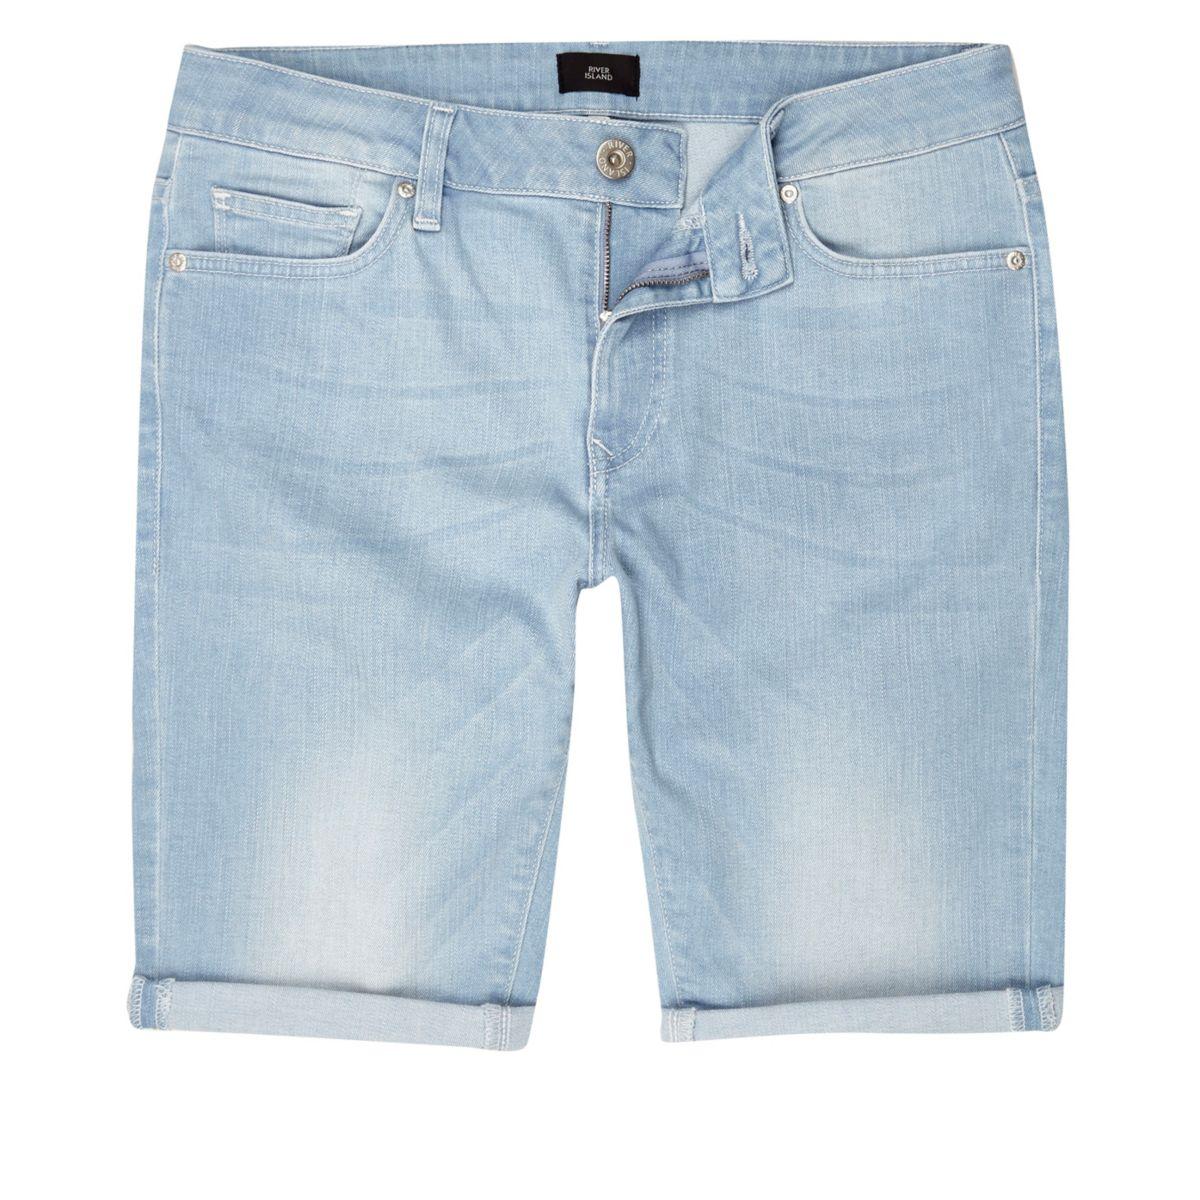 Light blue wash skinny fit denim shorts